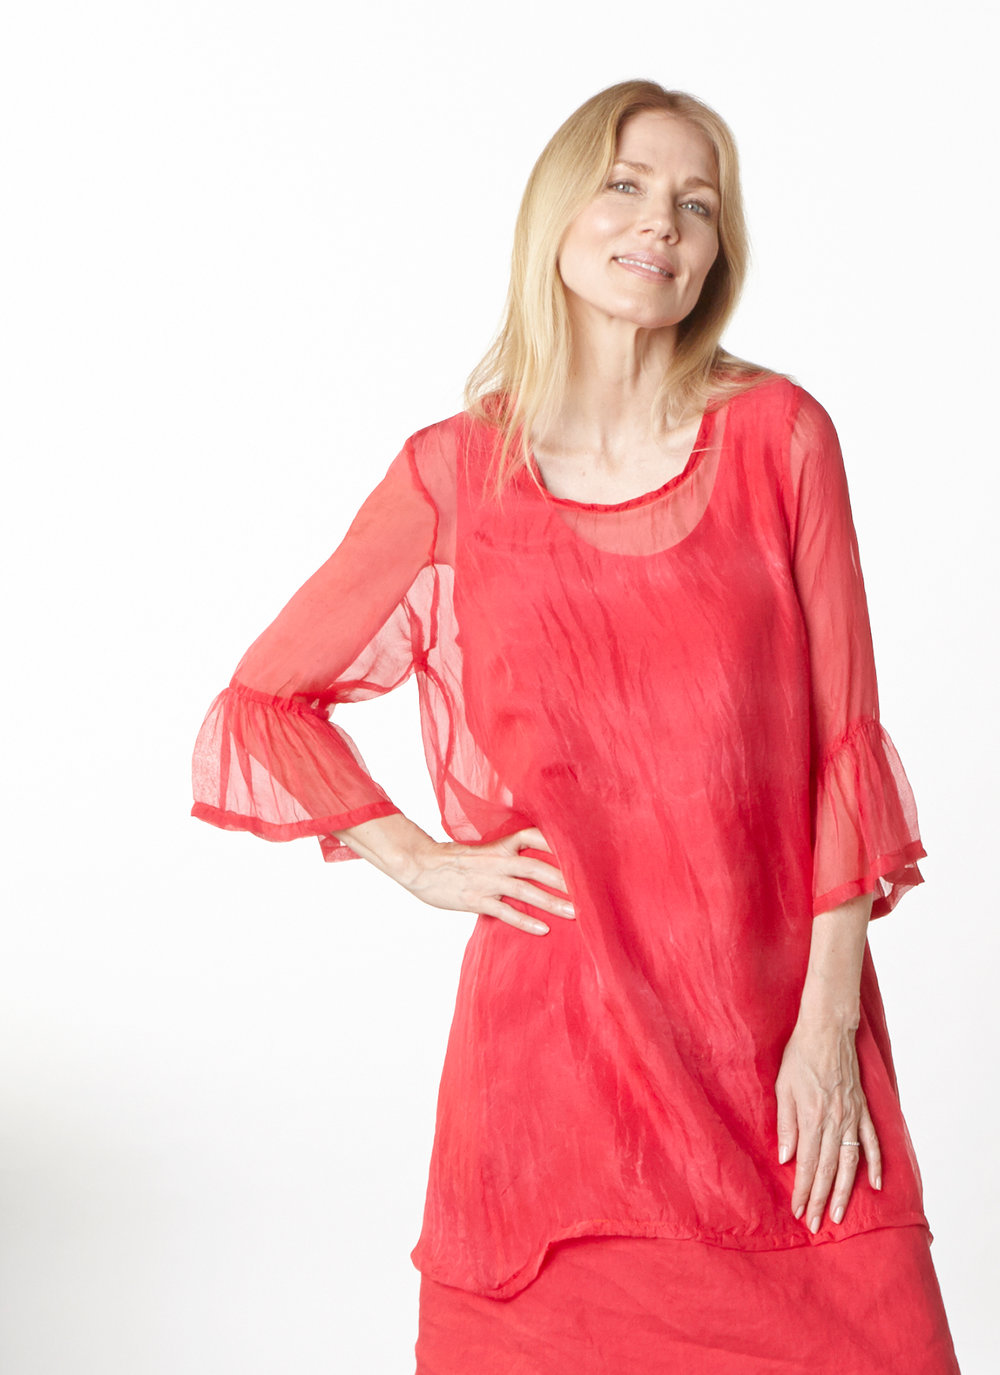 Phryne Tunic in Fuchsia Italian Sheer Tie Dye Silk, Luella Dress in Valerian Light Linen